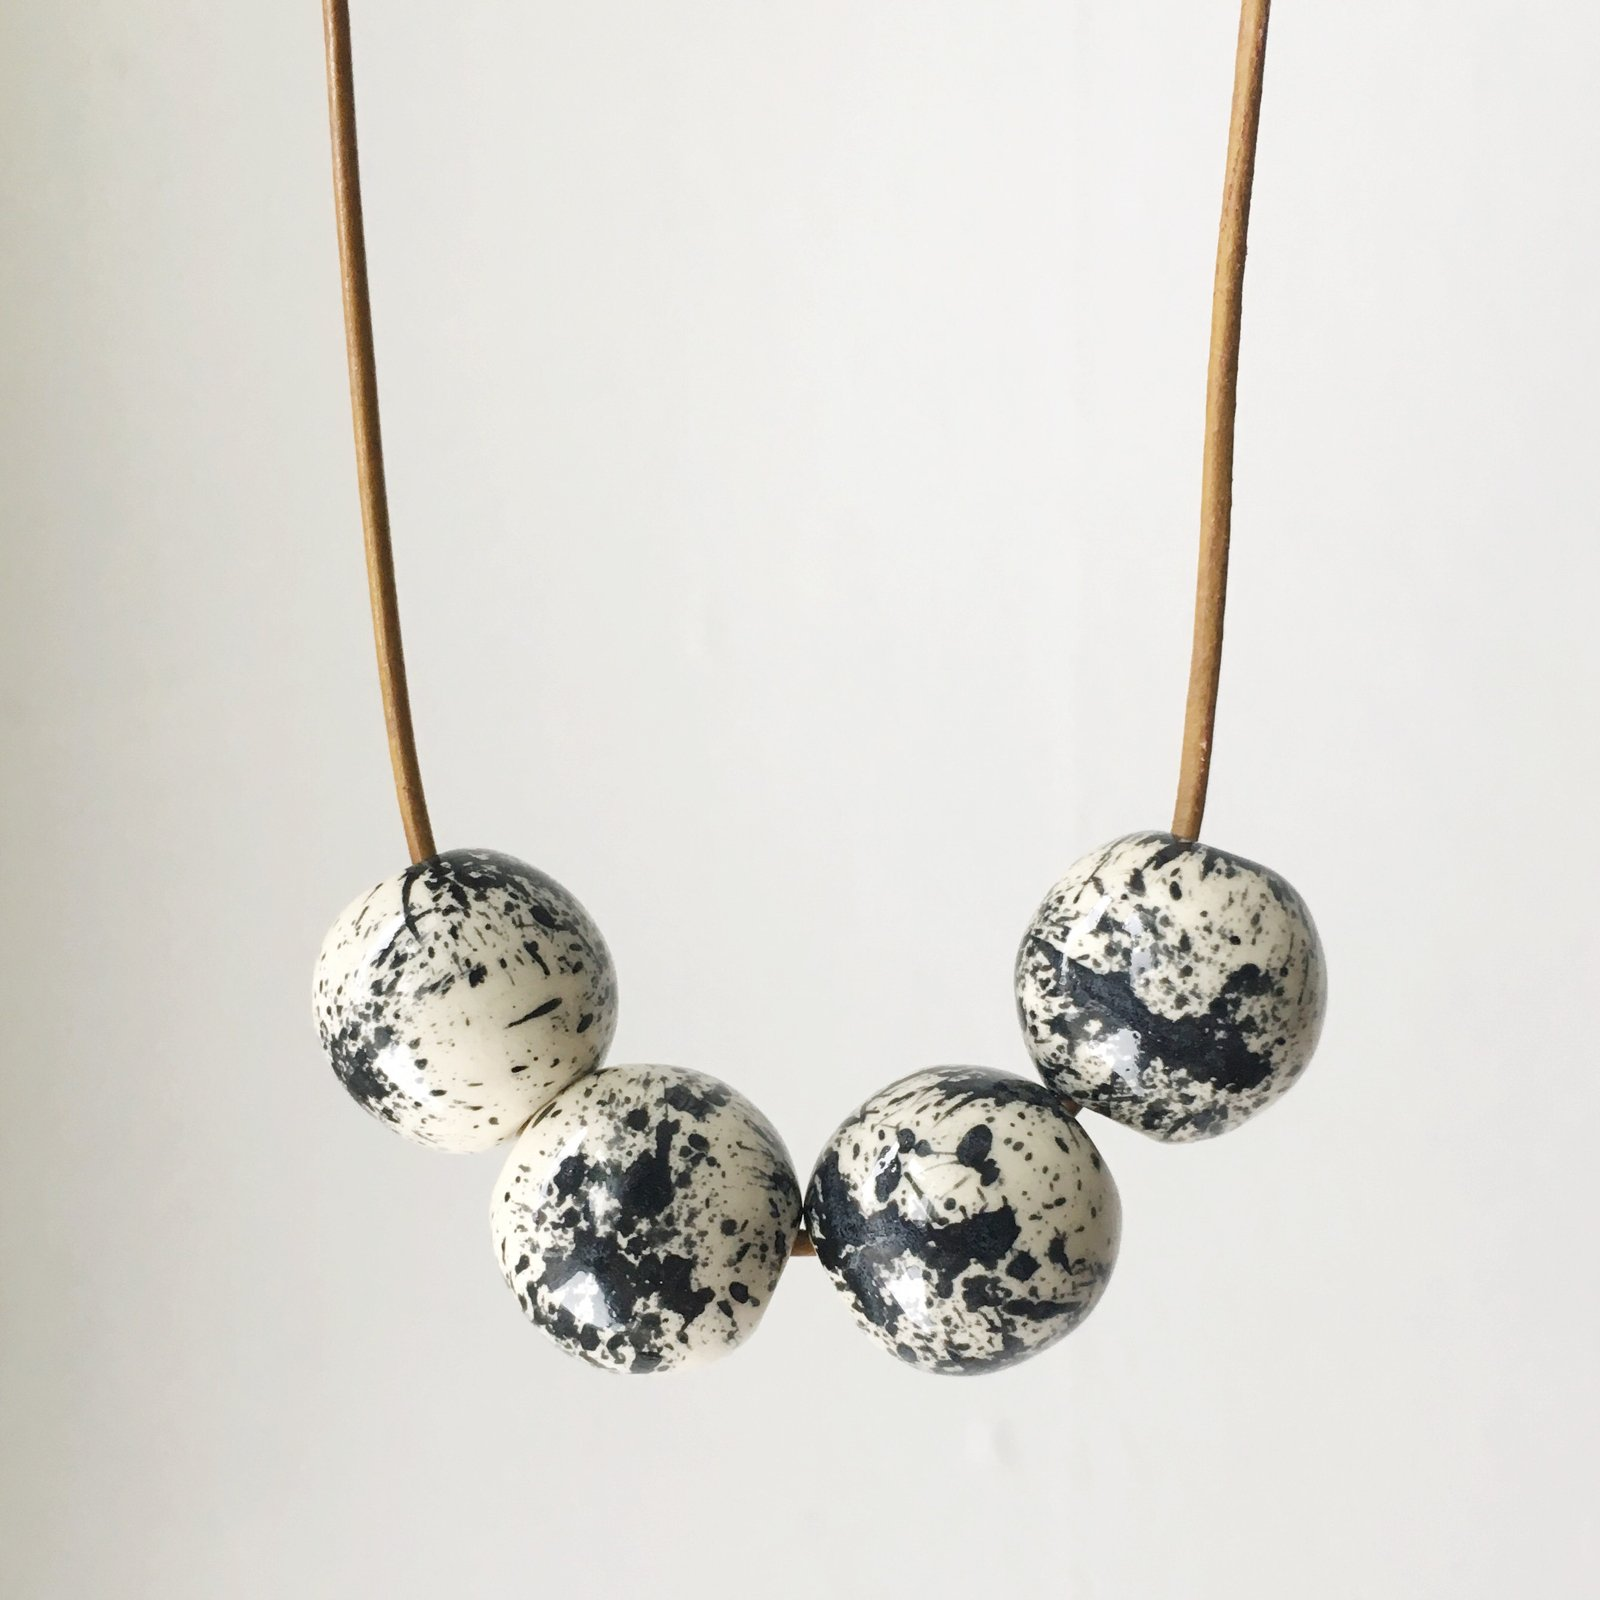 4 Bead Necklaces -